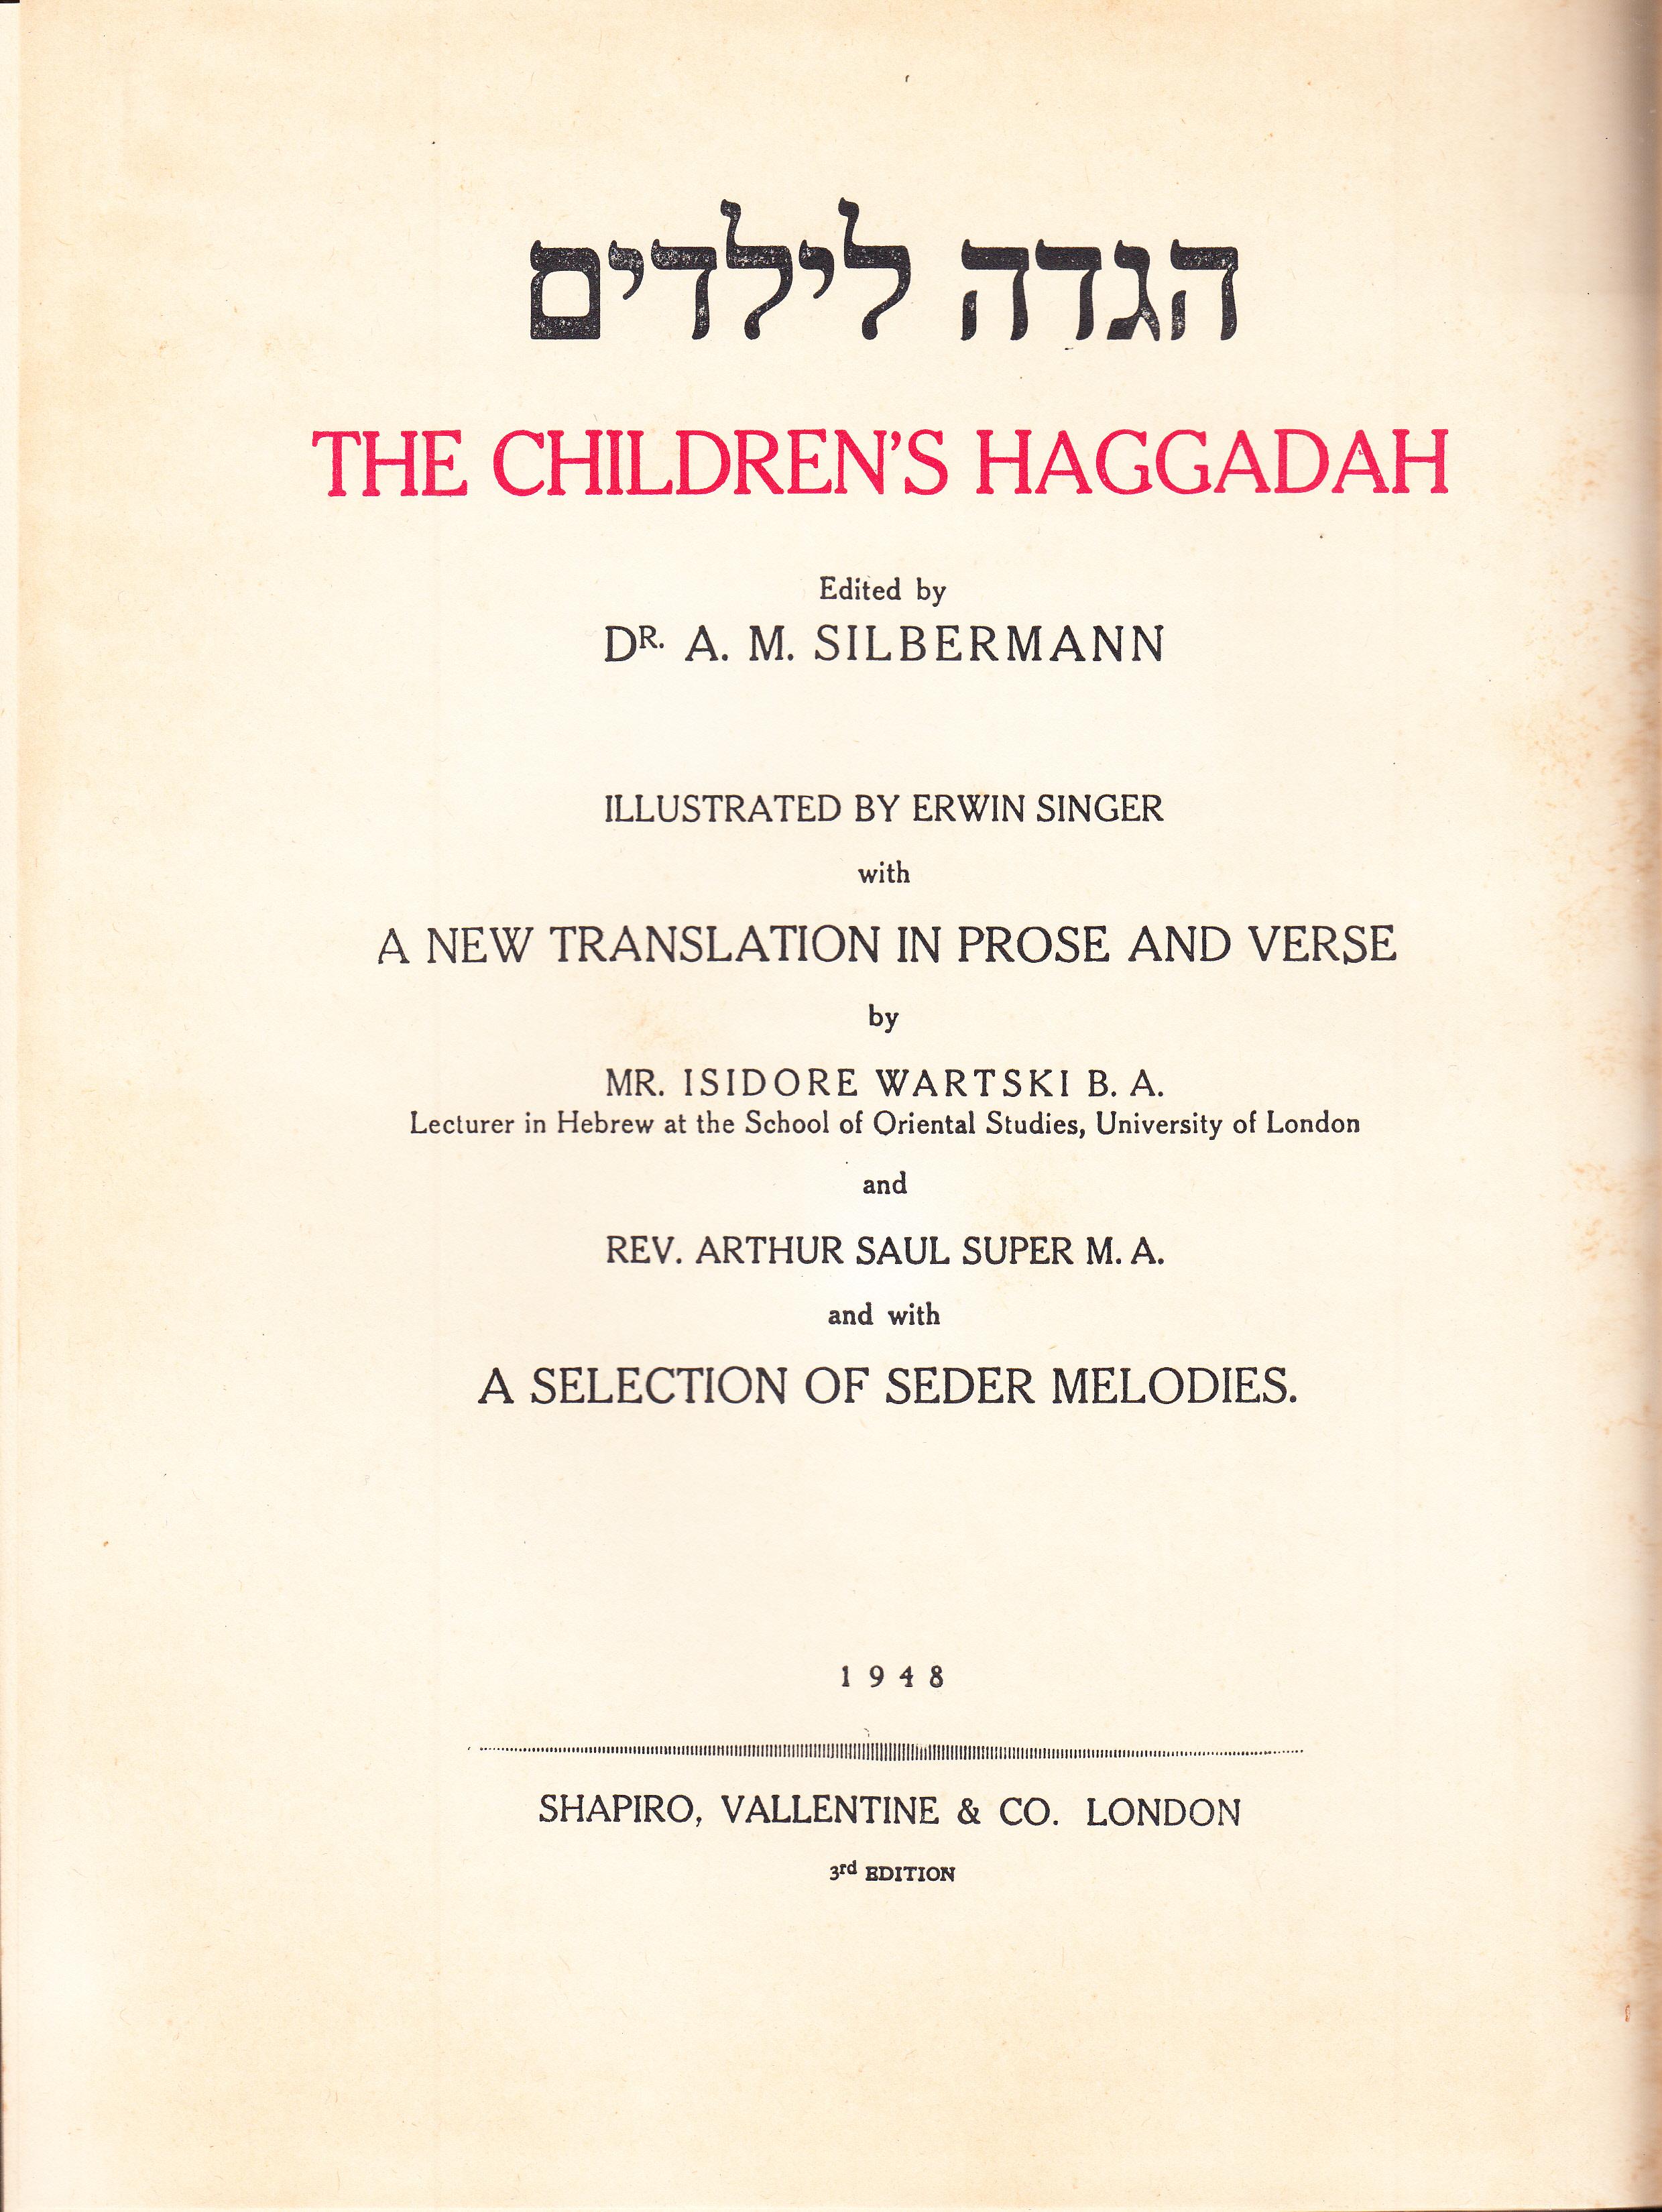 5j Childrens Hag_0003